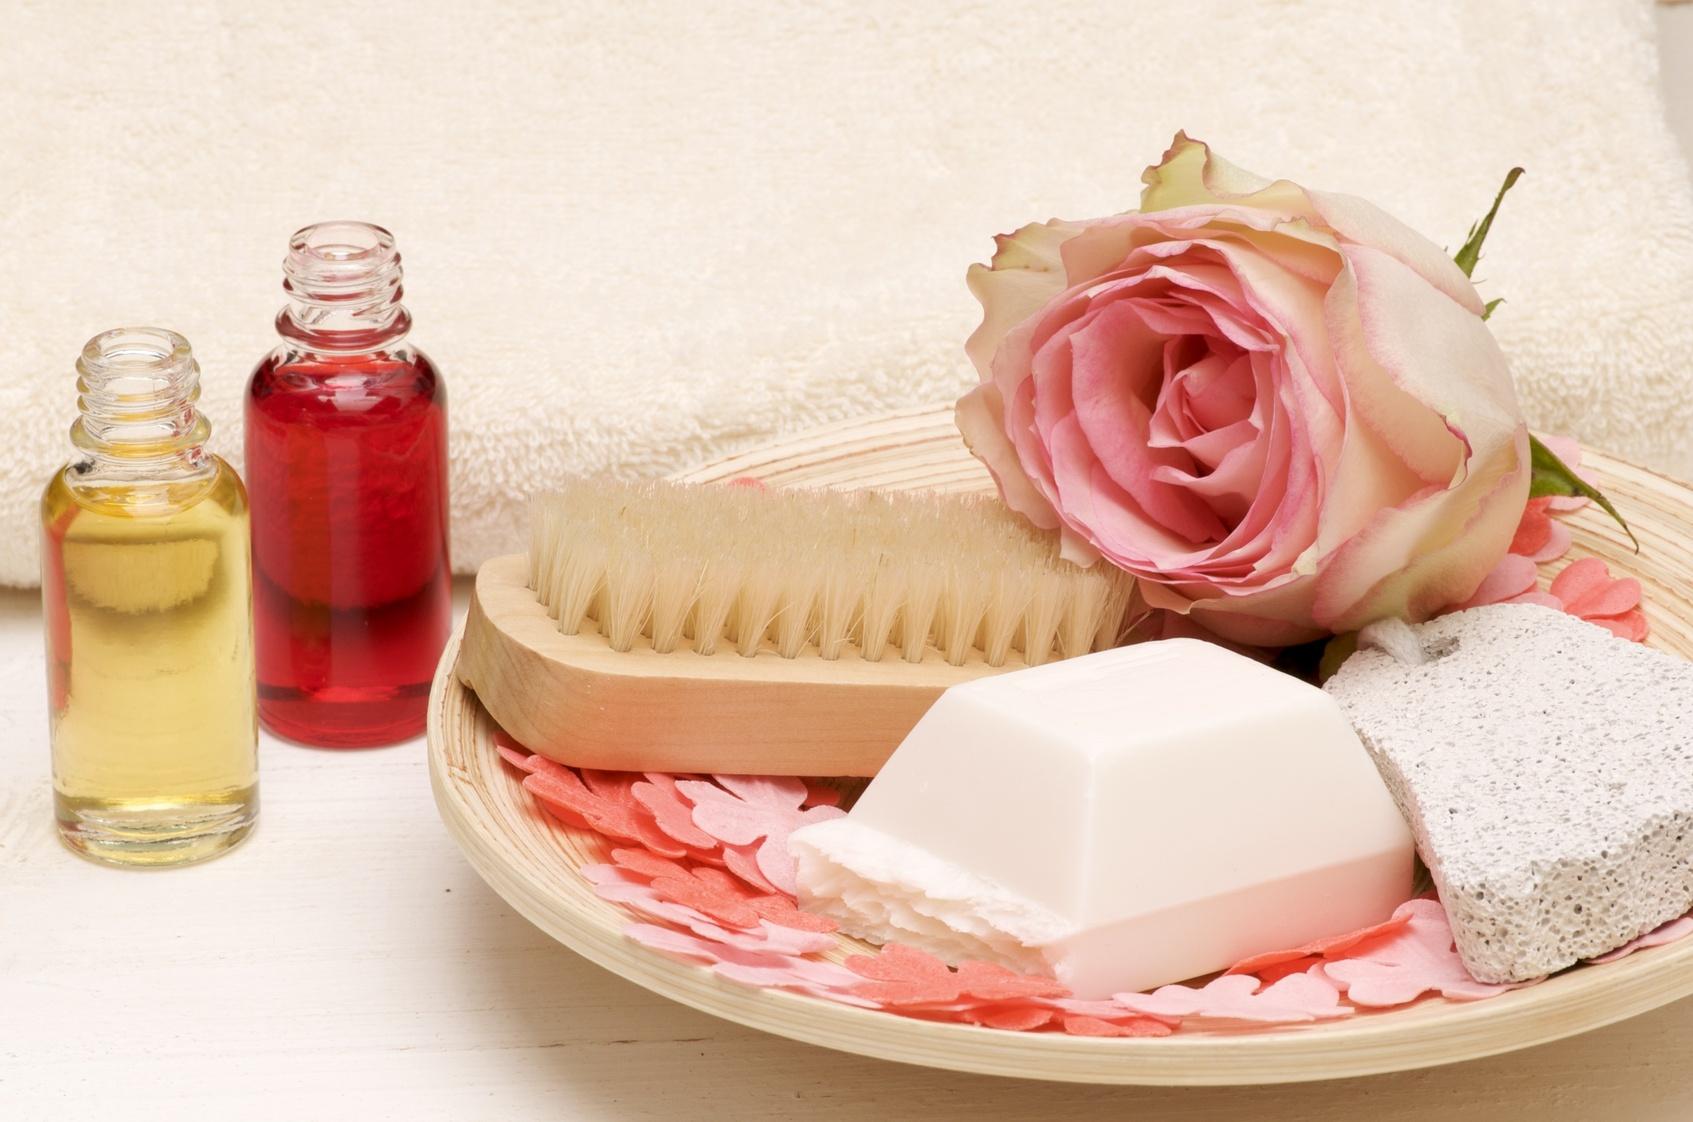 http://www.aromatherapie-huiles-essentielles.com/wp-content/uploads/2008/11/aromatherapie_cosmetique1.jpg